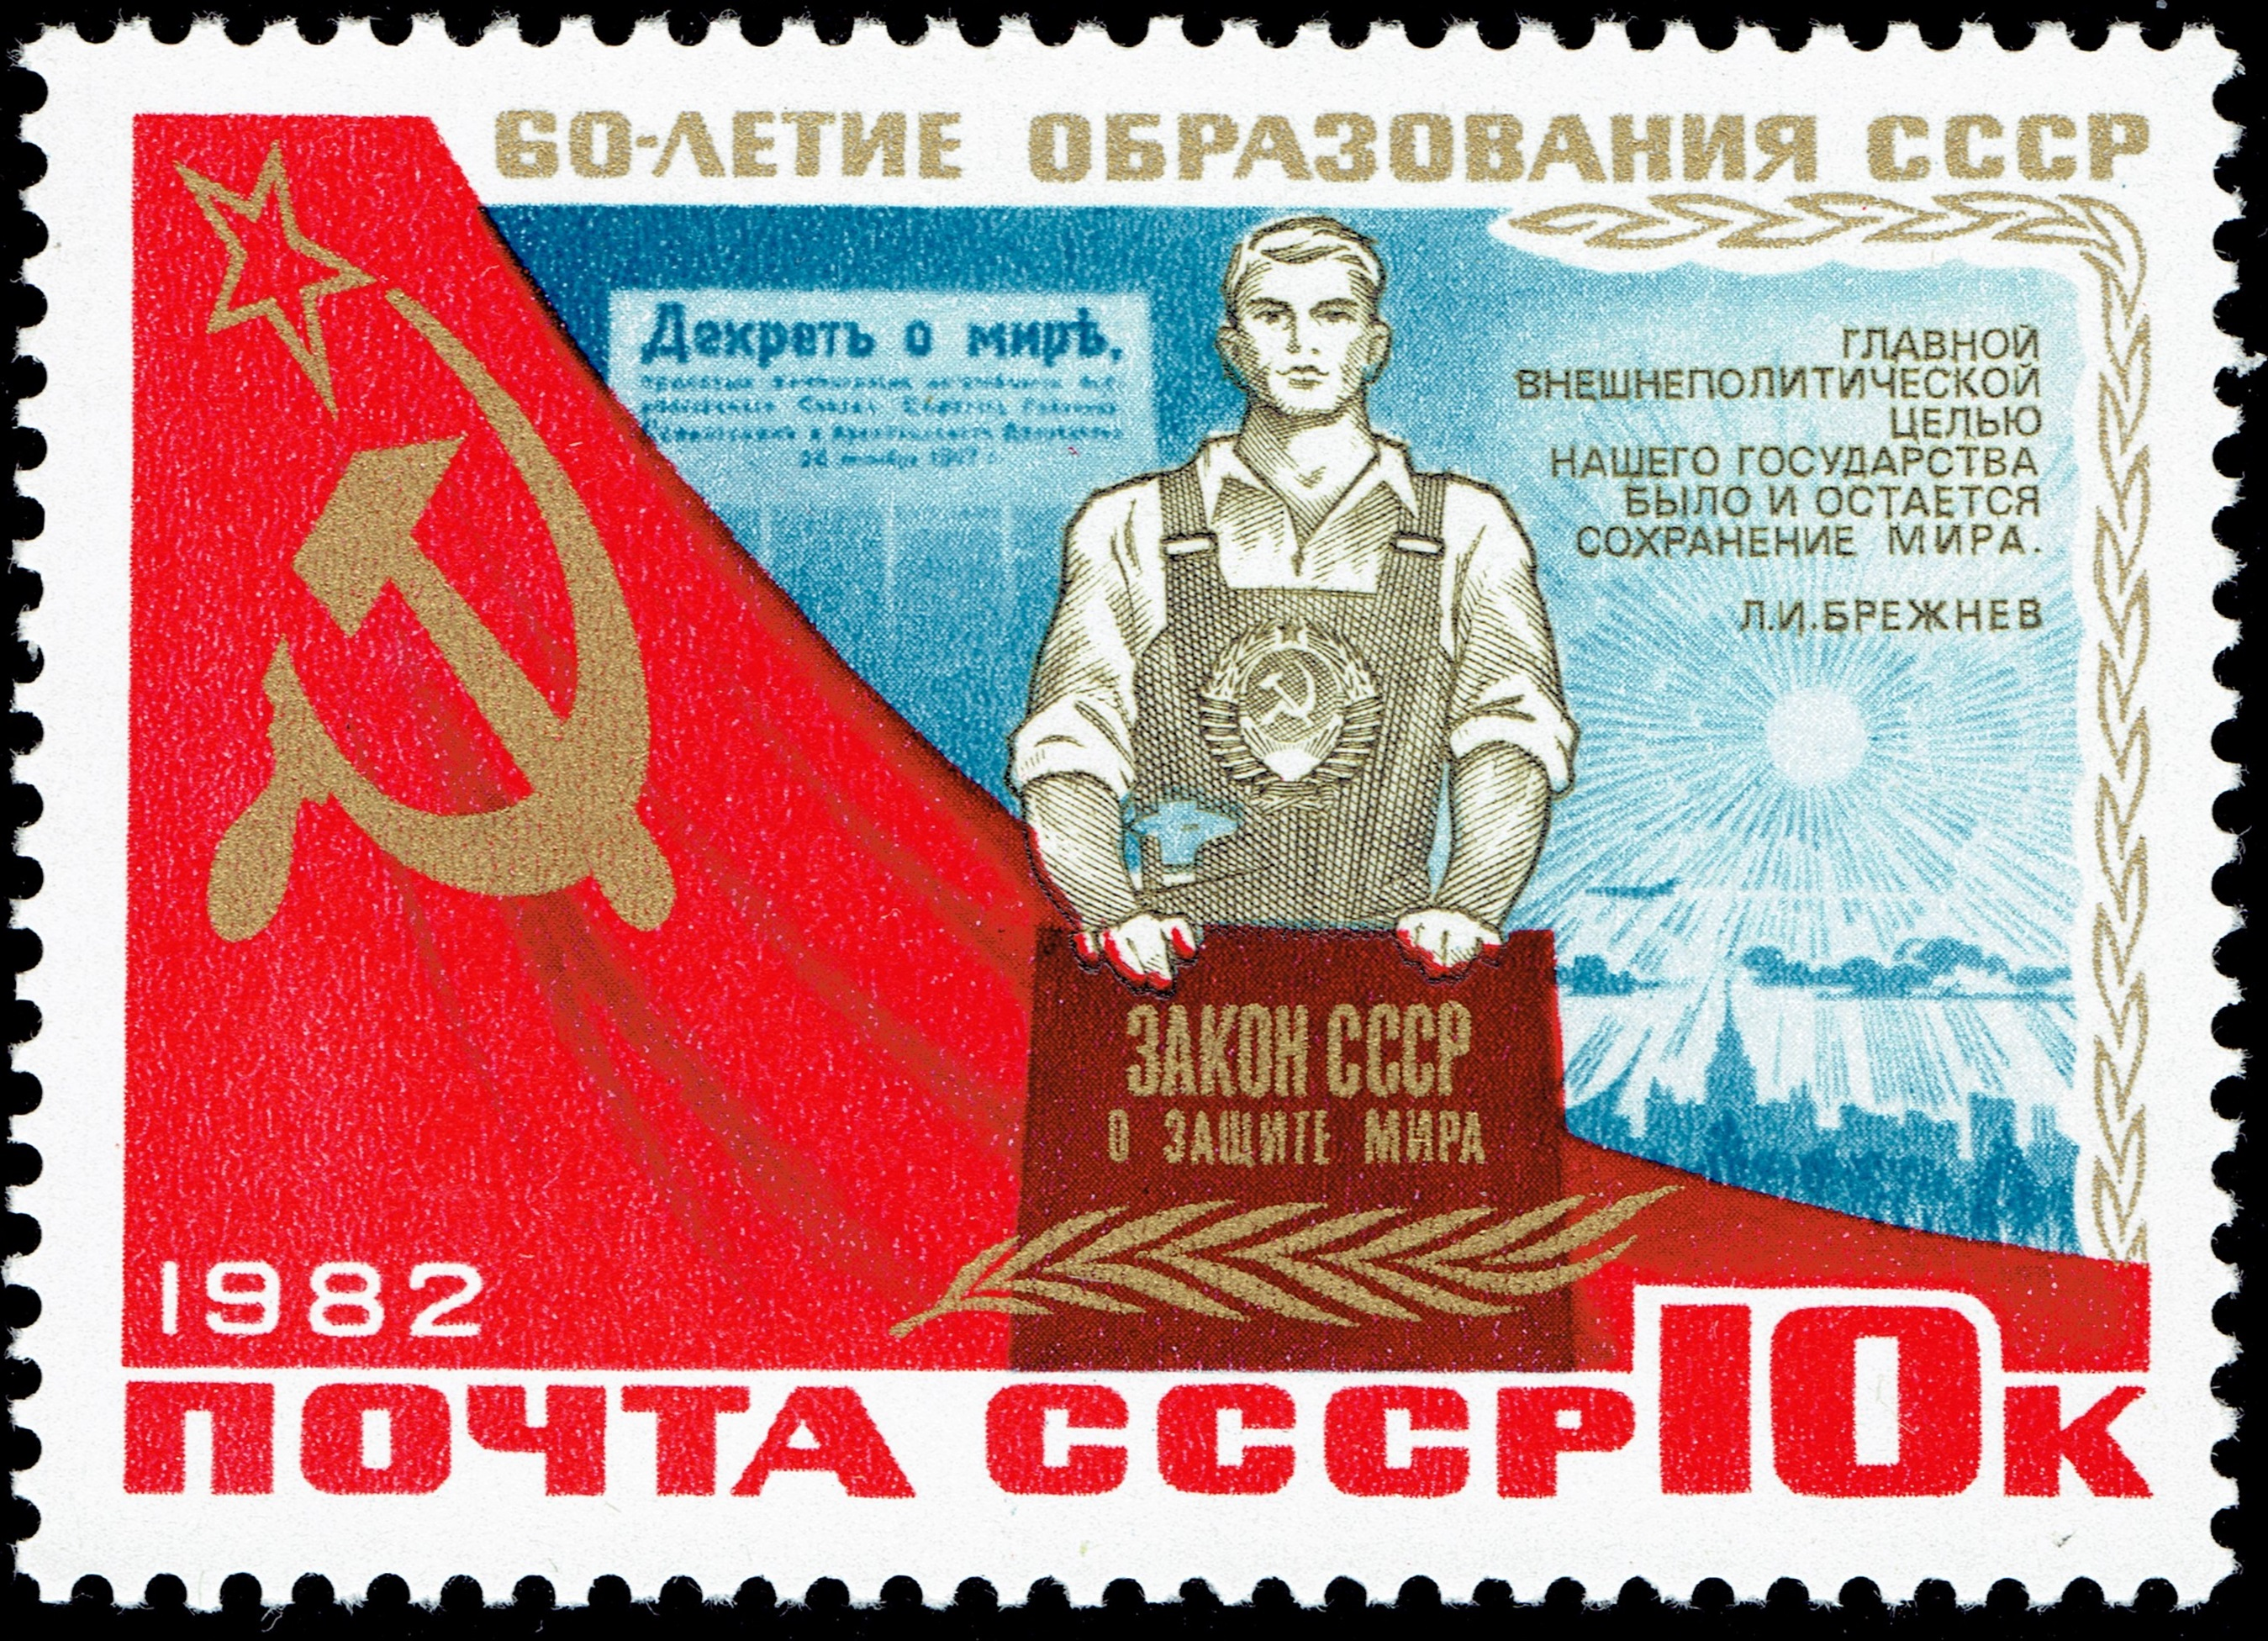 Union of Soviet Socialist Republics - Scott #5094 (1982): worker at podium, decree text